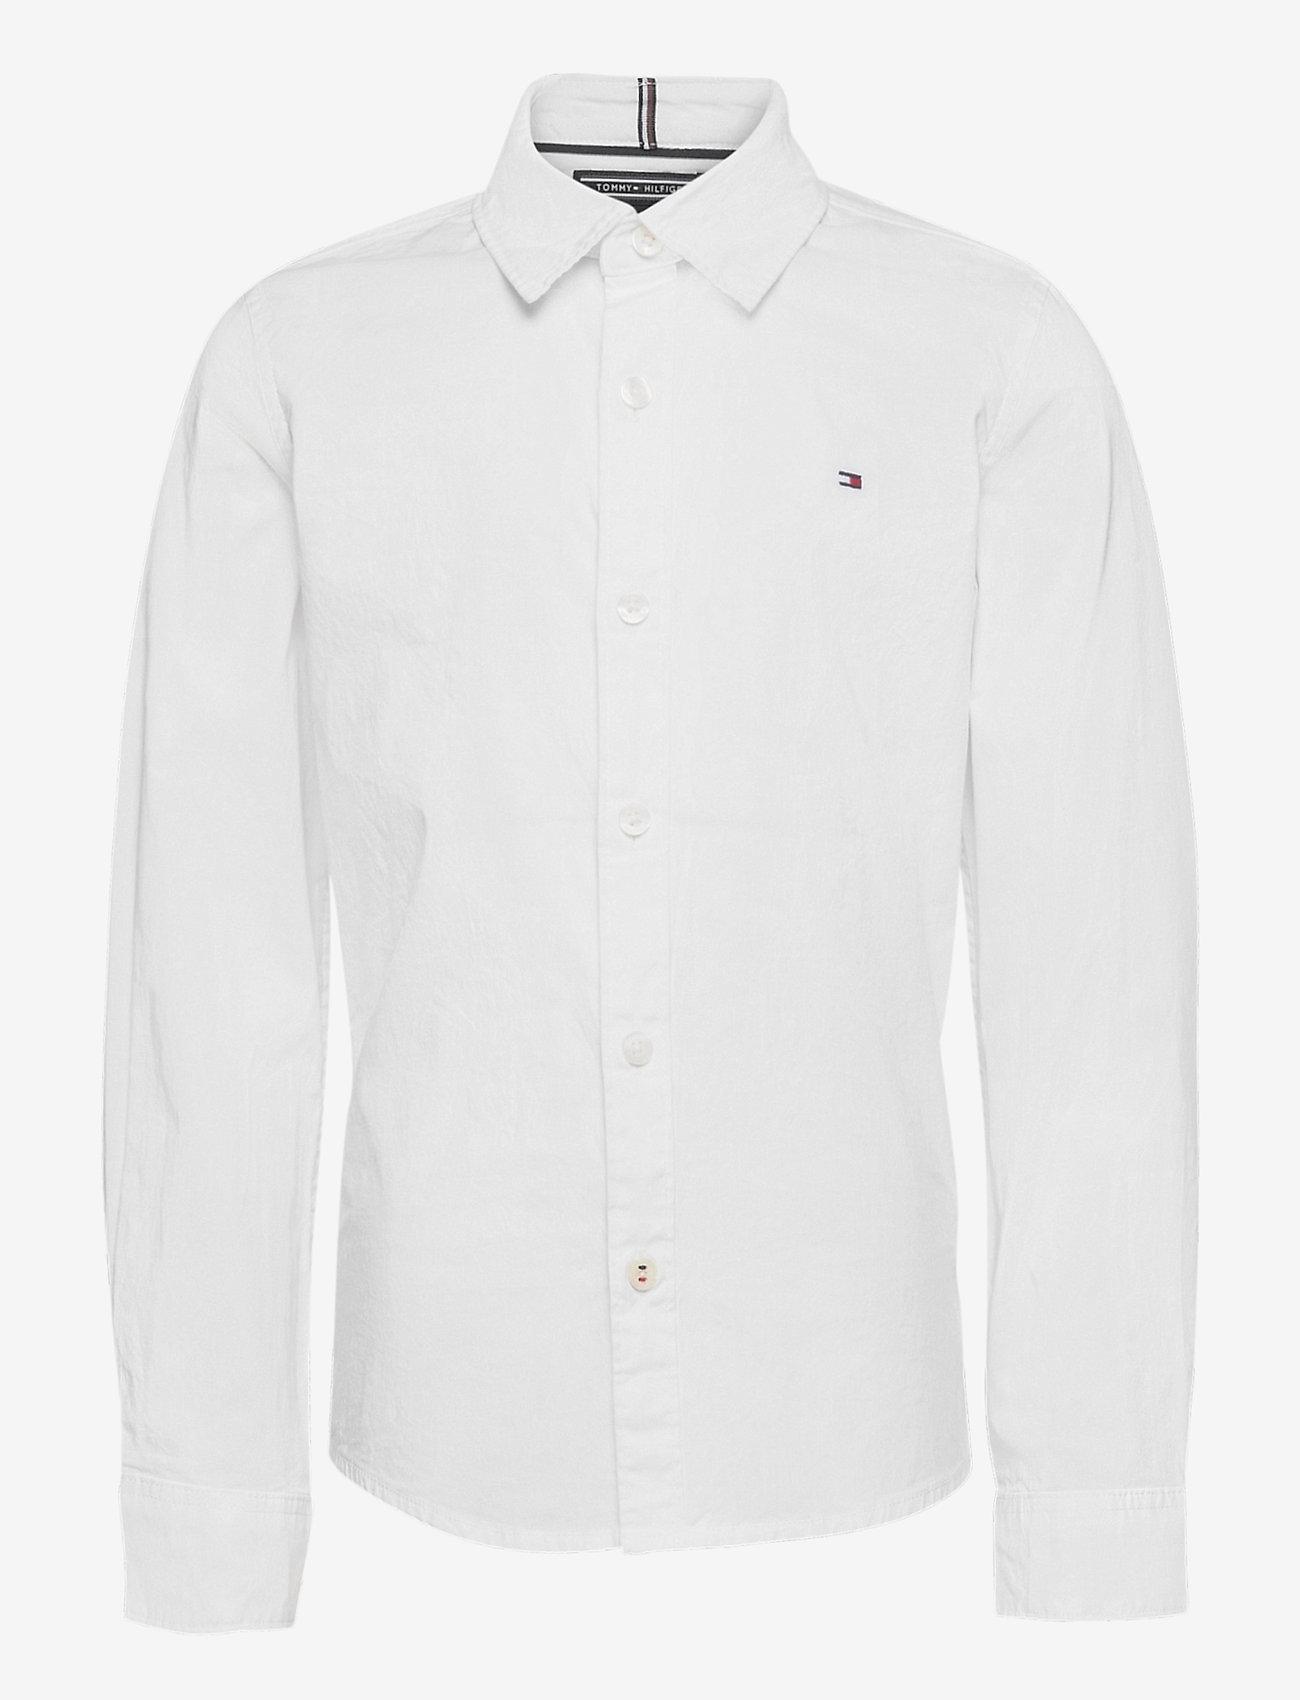 Tommy Hilfiger - BOYS SOLID STRETCH POPLIN SHIRT L/S - overhemden - bright white - 0